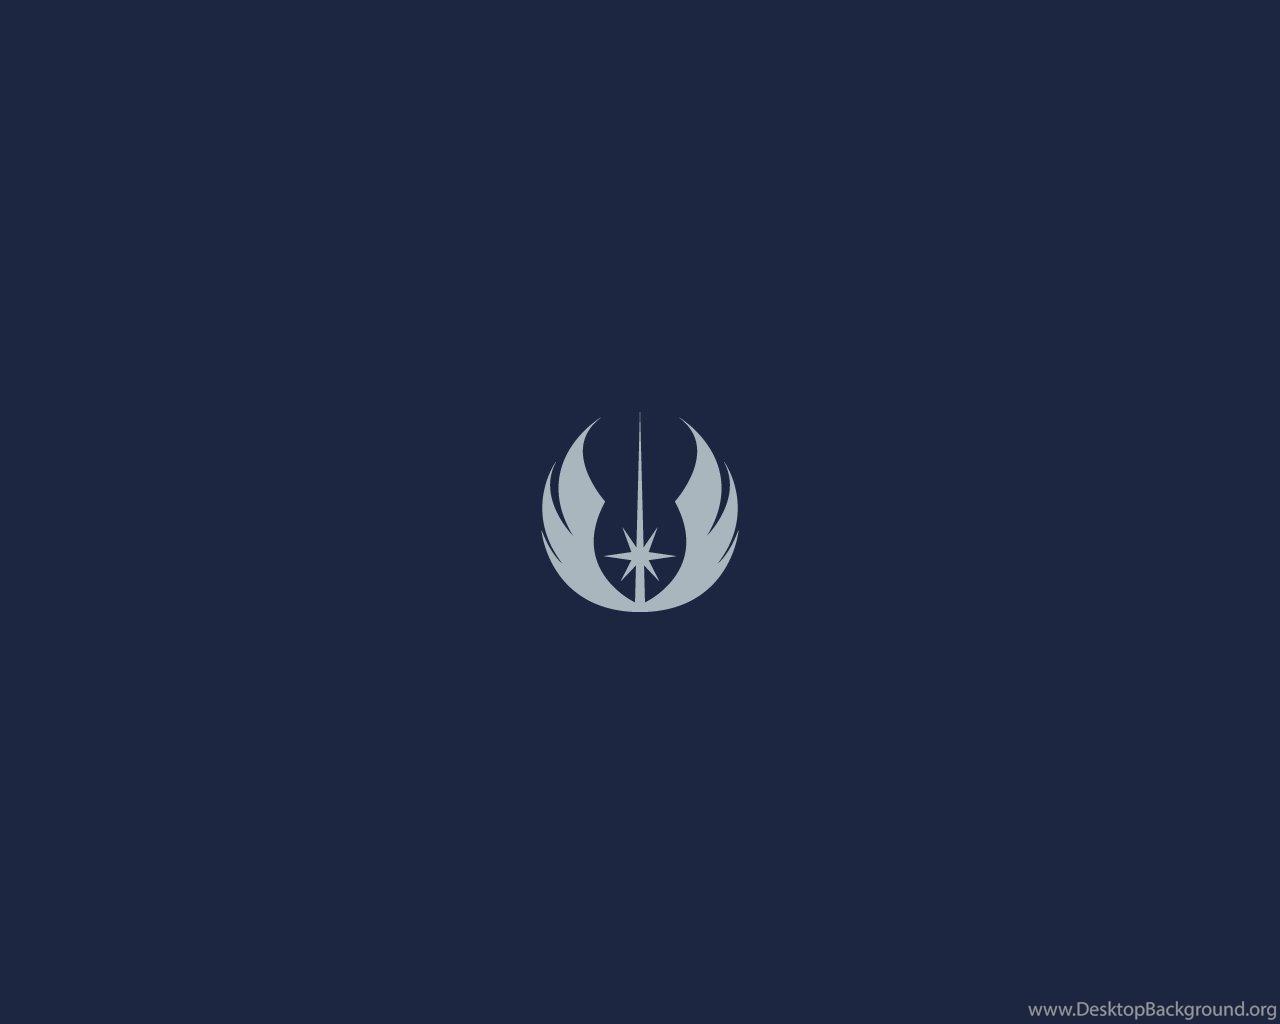 Minimalist Star Wars Wallpaper Jedi Emblem By Diros On Deviantart Desktop Background